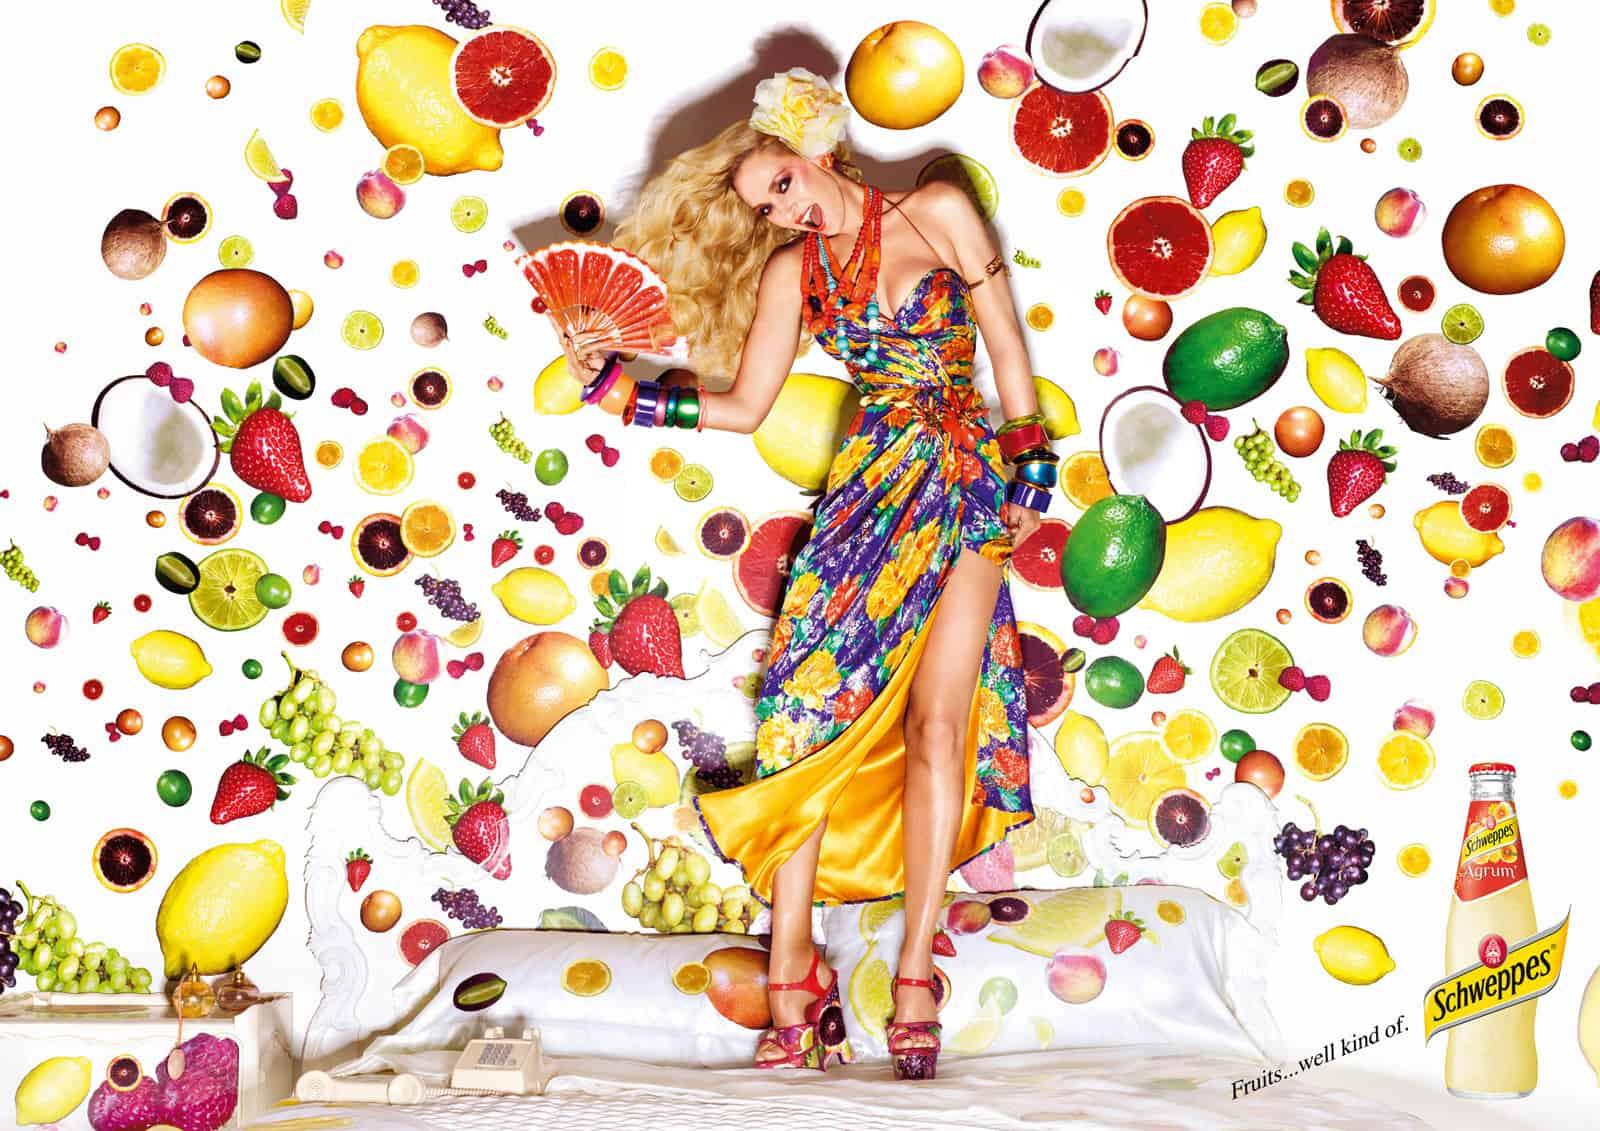 Pub Schweppes : fruits